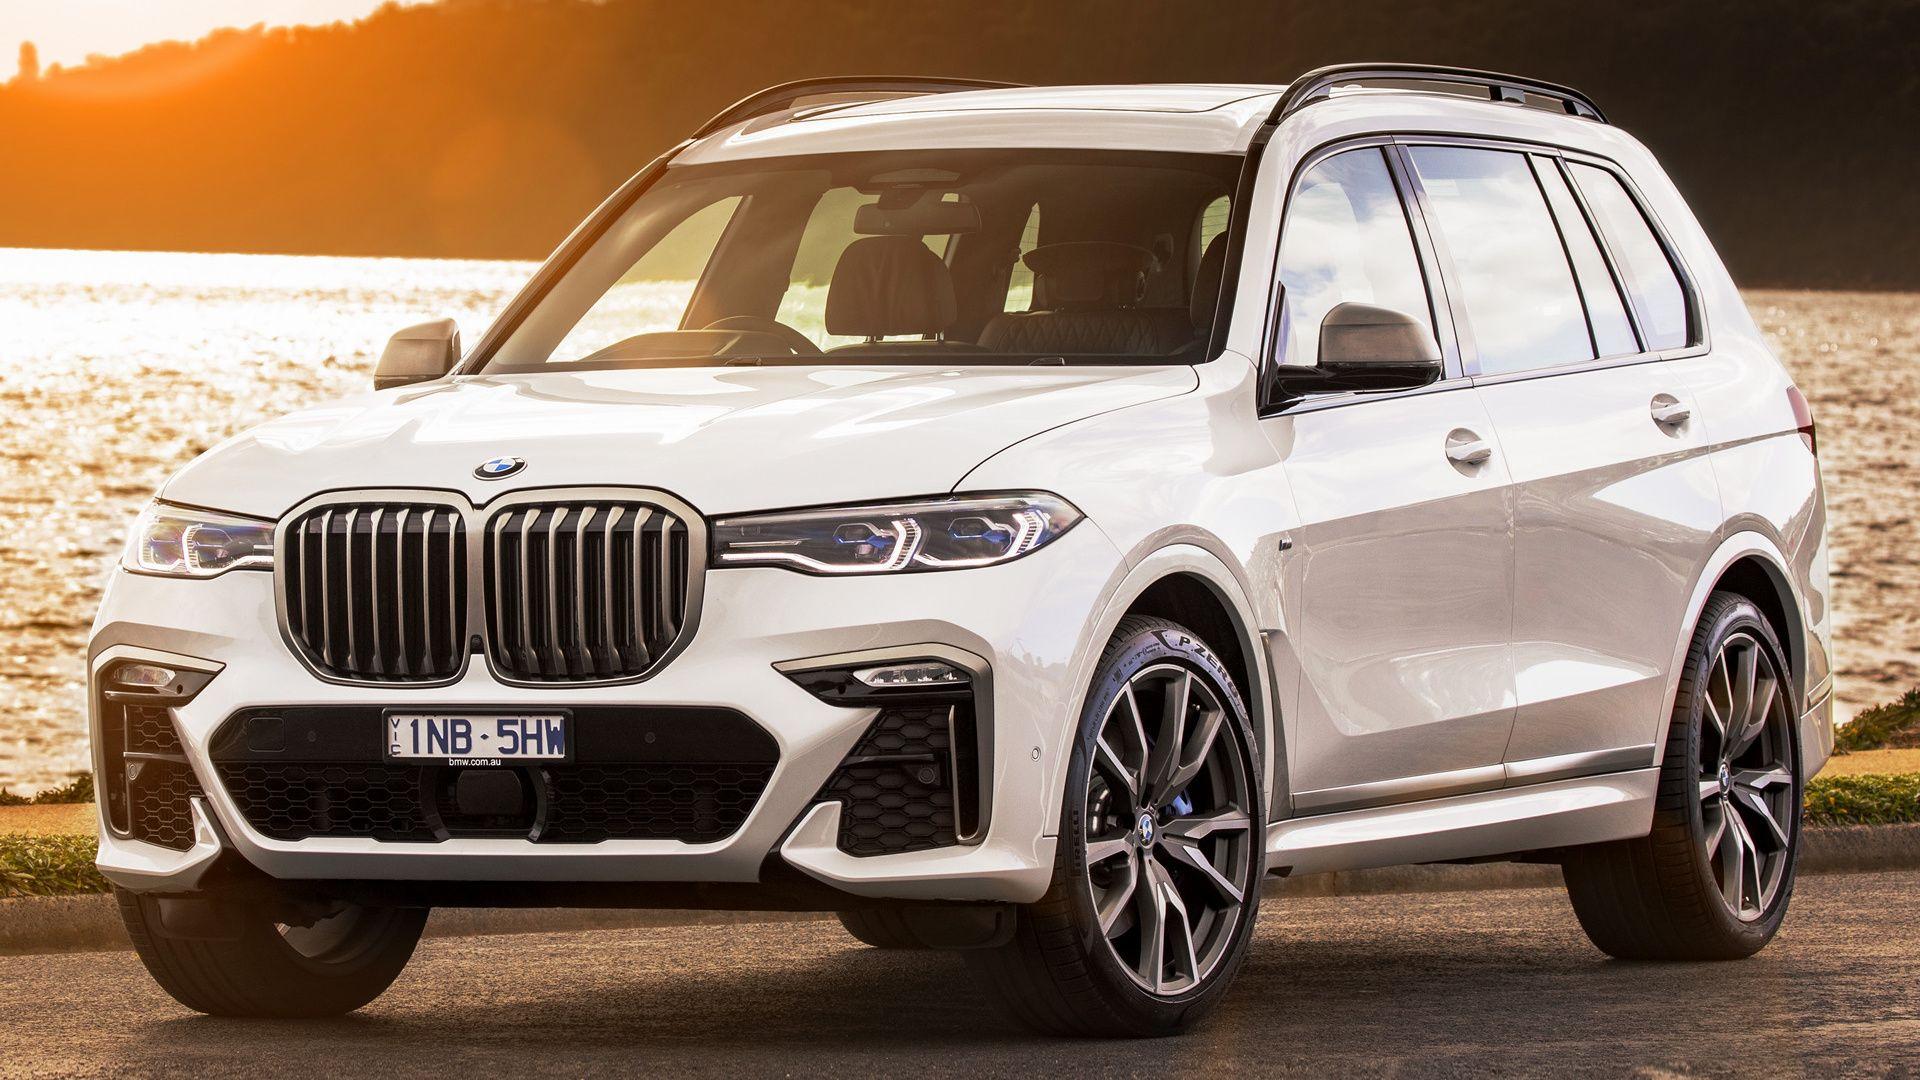 Vehicles Bmw X7 M50d Bmw Full Size Car Suv Luxury Car White Car